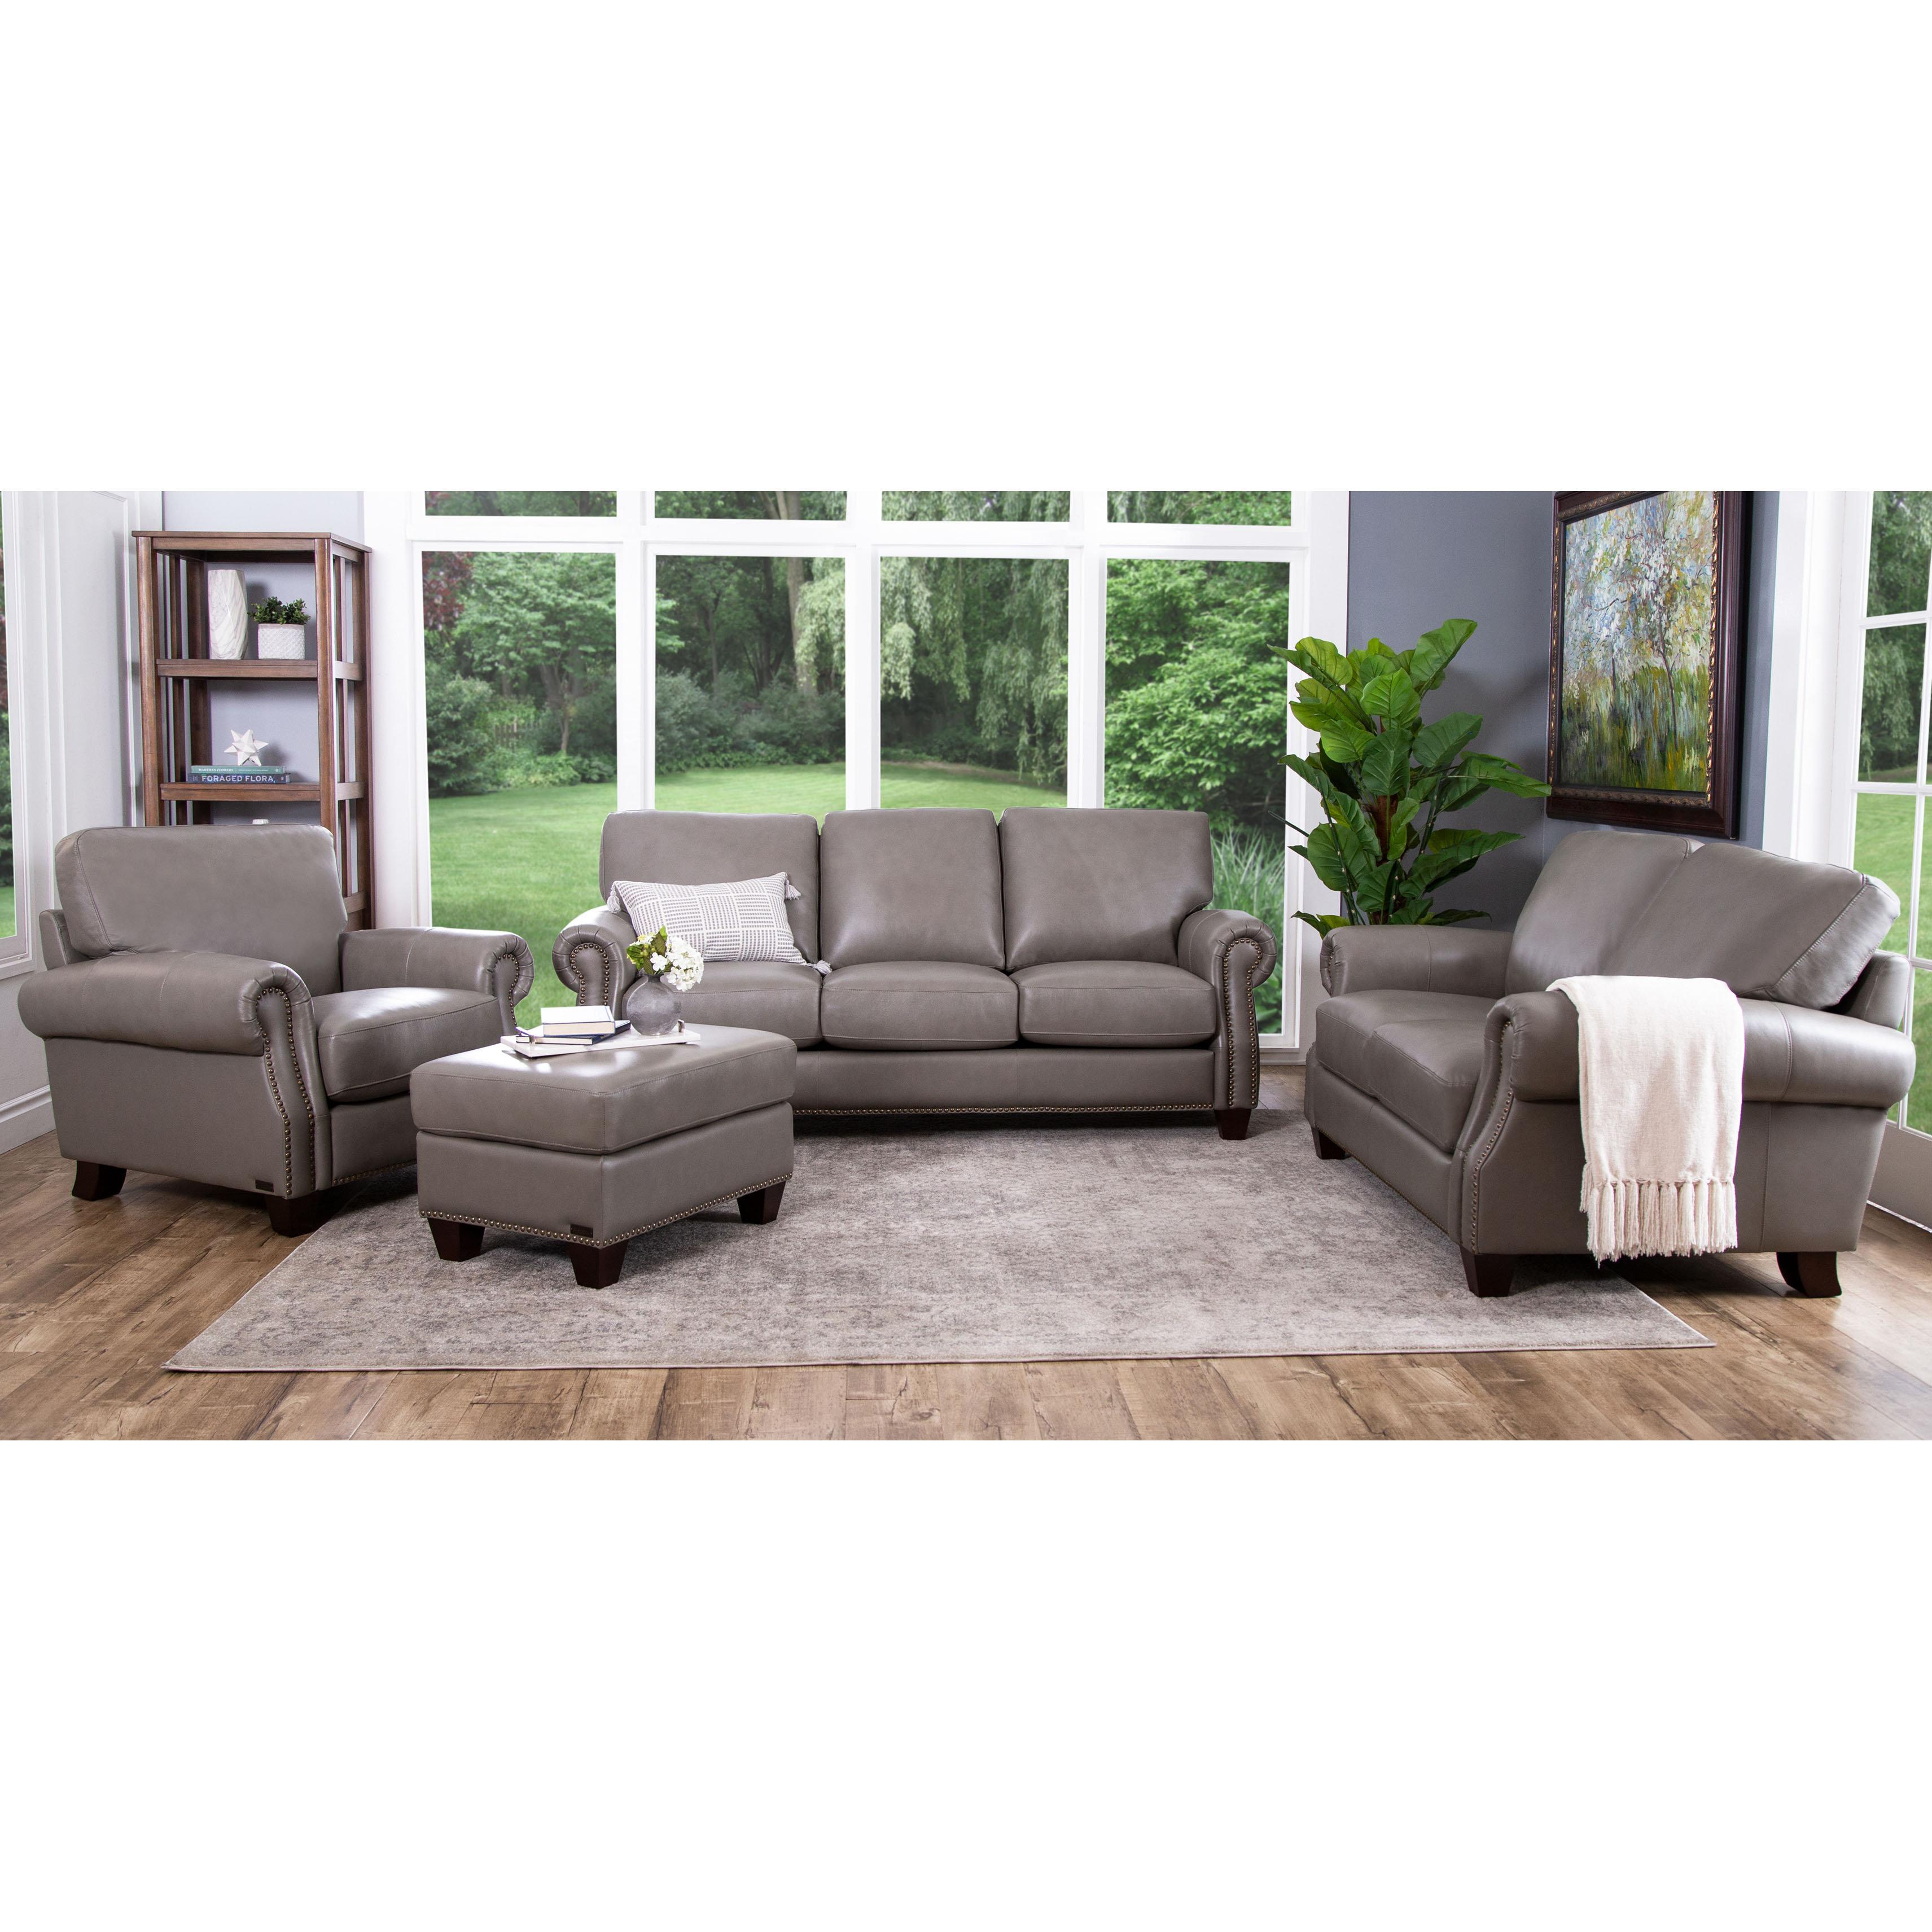 Three Posts Whipton 4 Piece Leather Living Room Set & Reviews | Wayfair